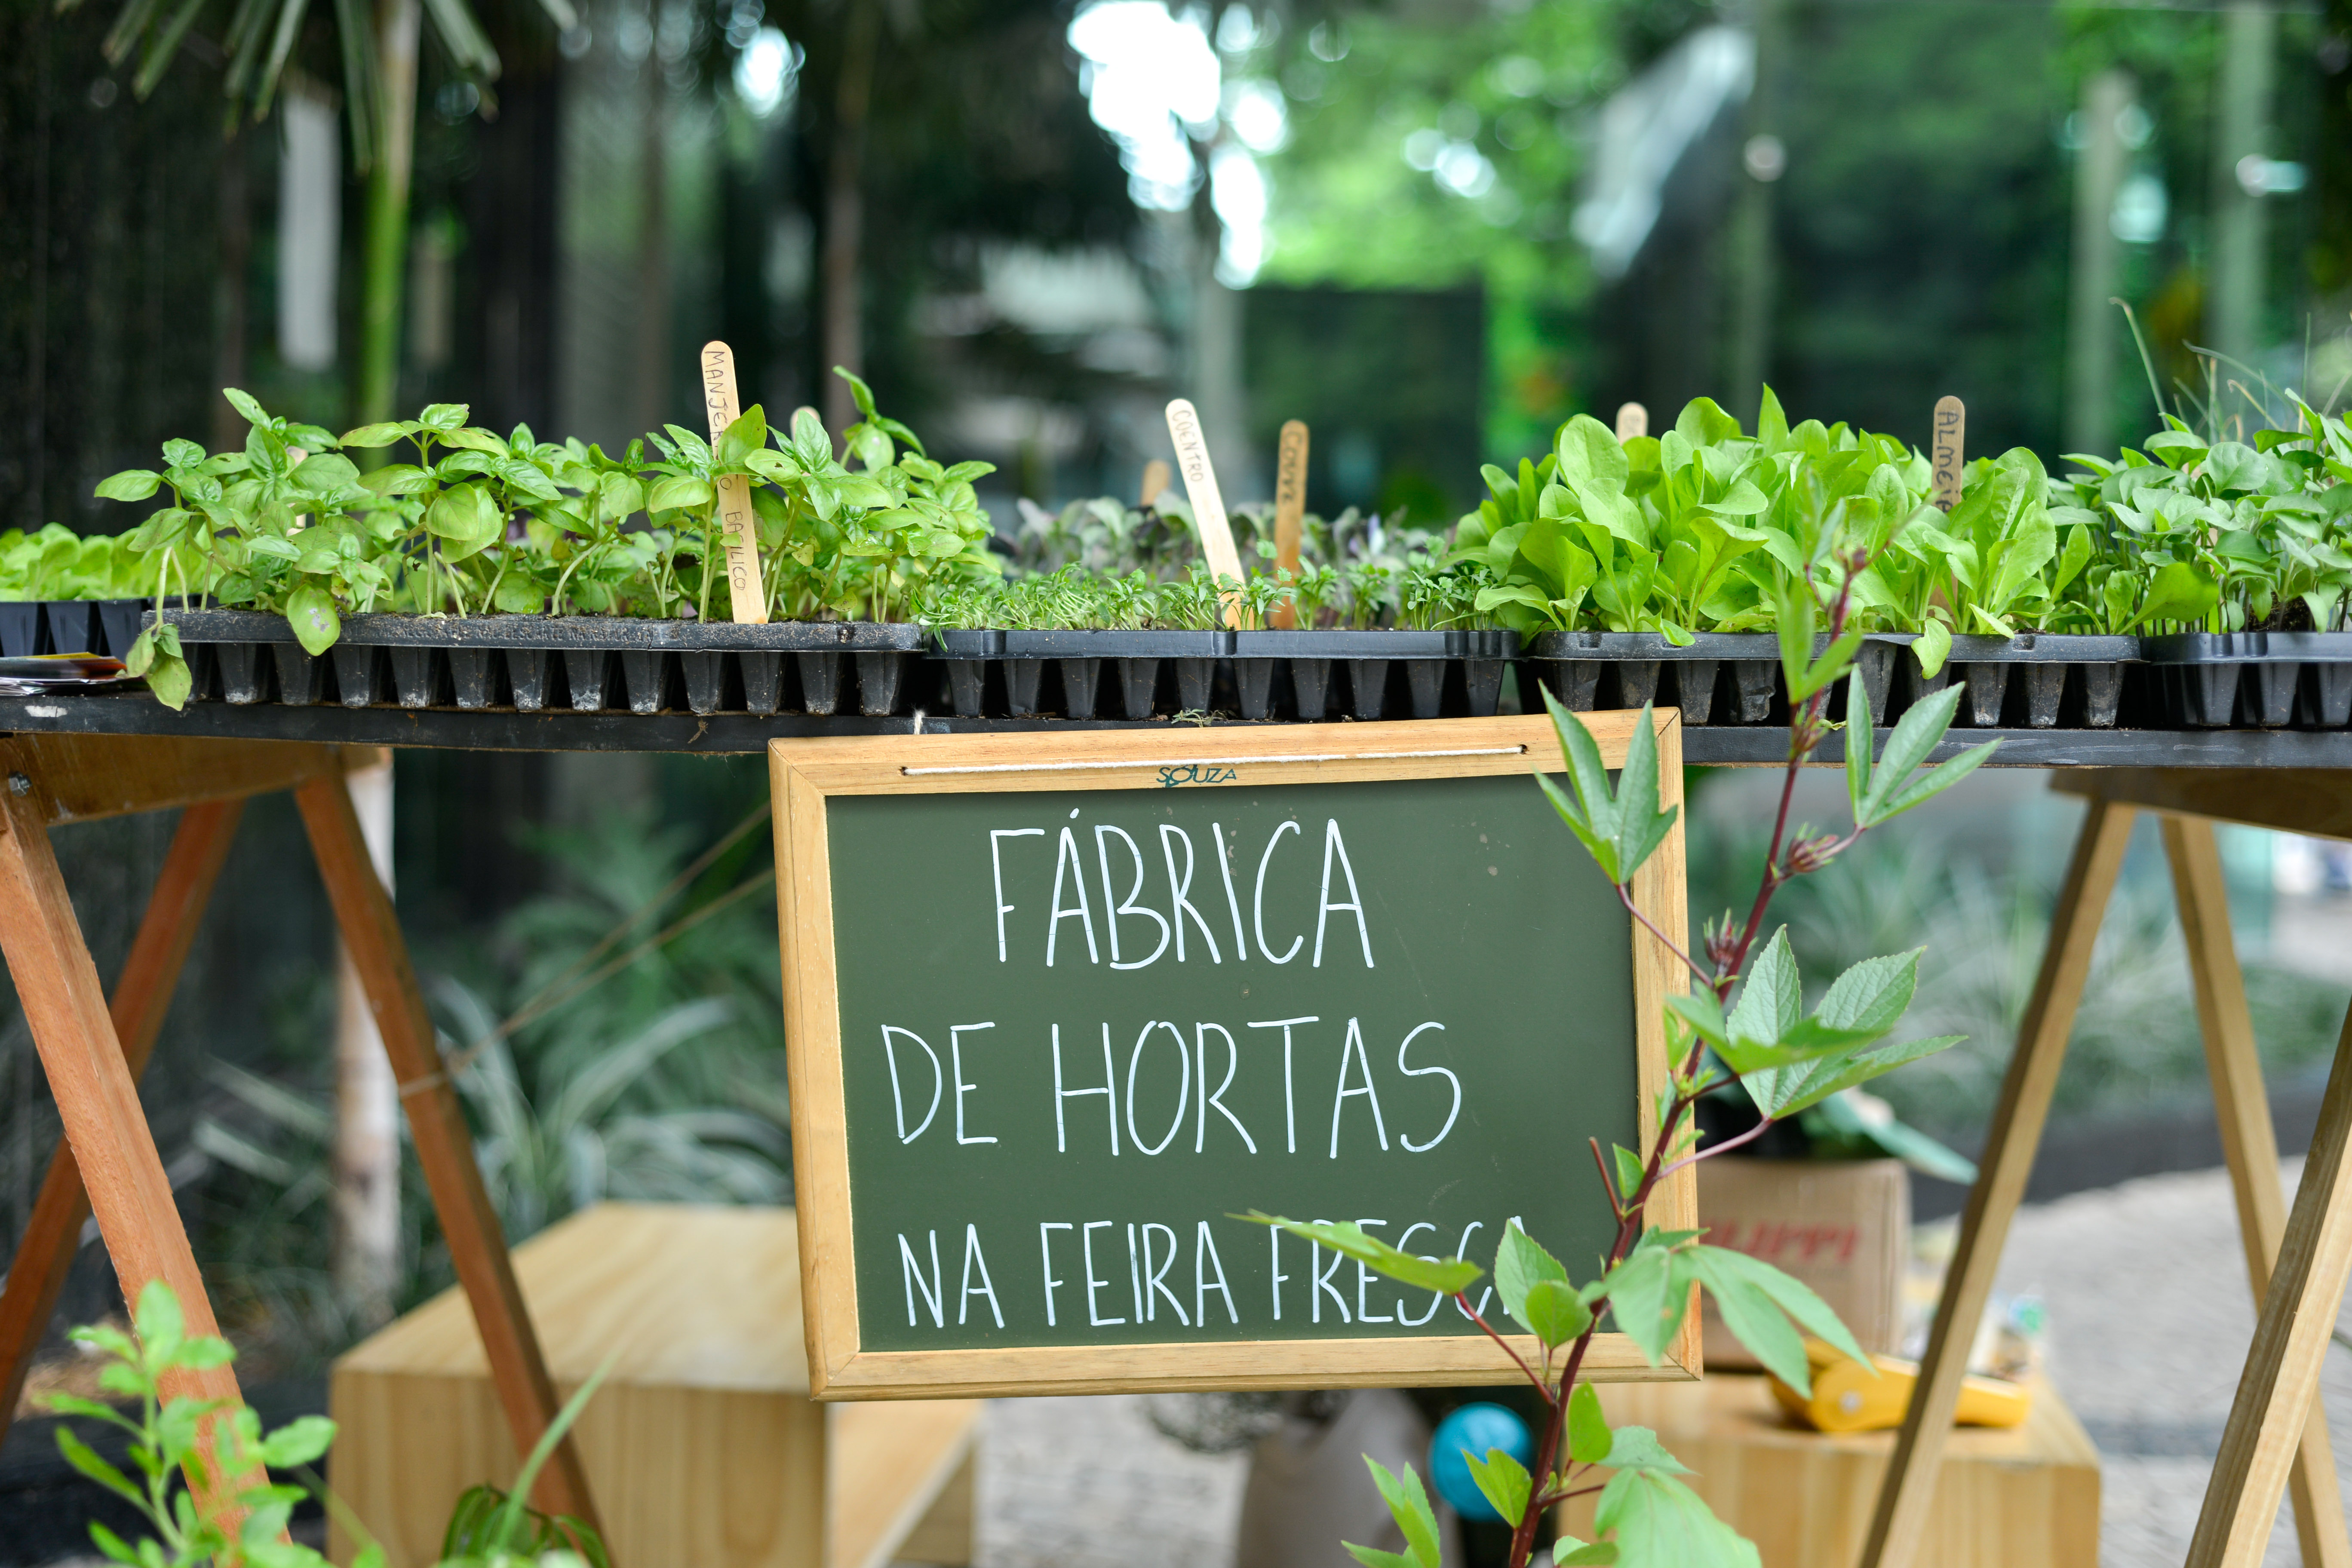 Fábrica de Hortas Feira Fresca